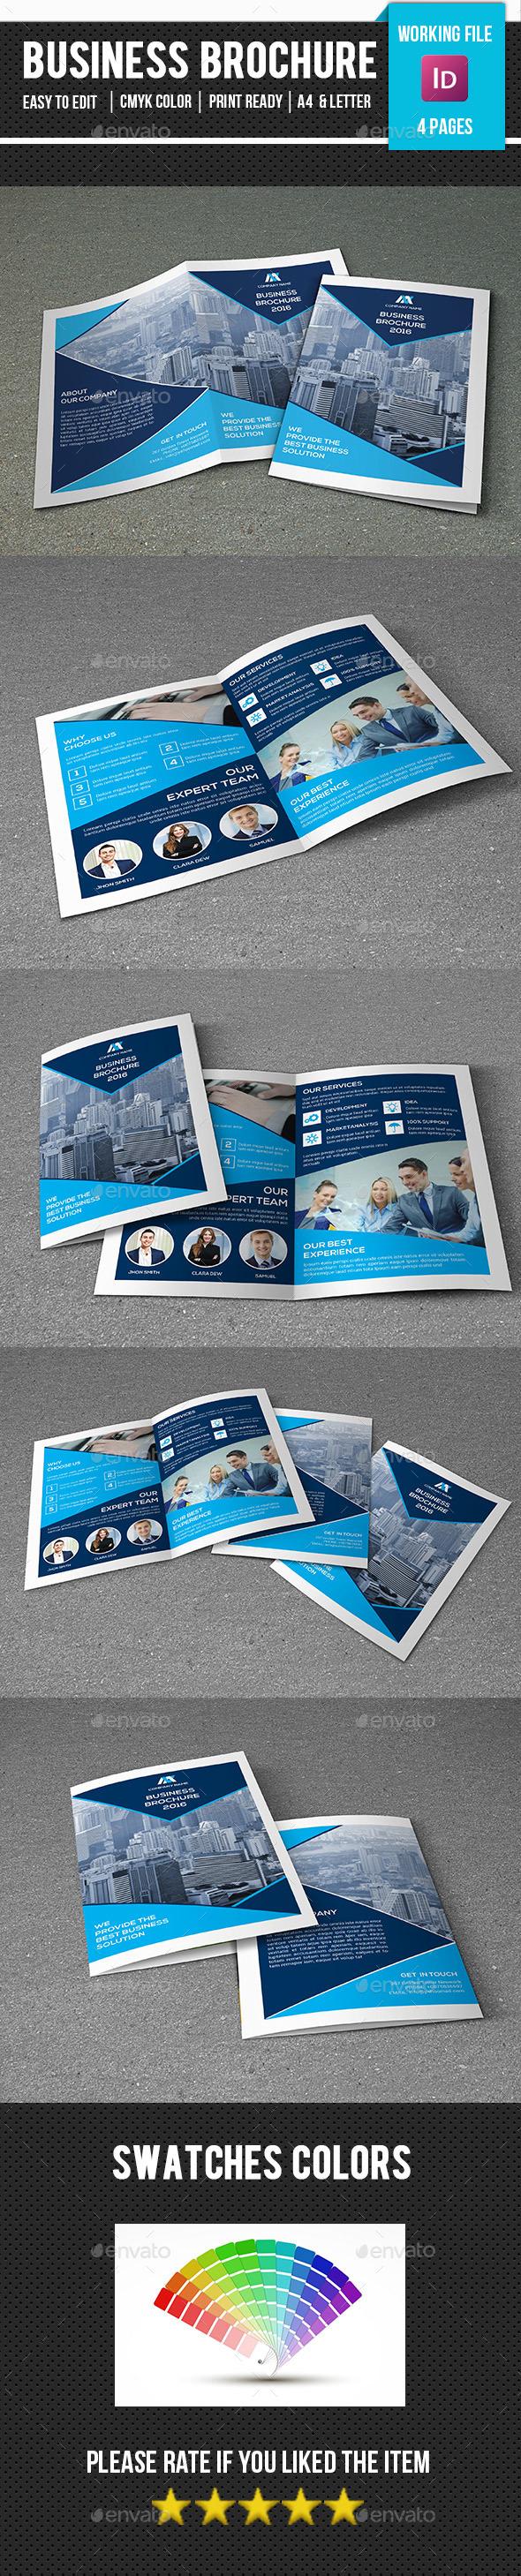 Corporate Brochure Template-V334 - Corporate Brochures